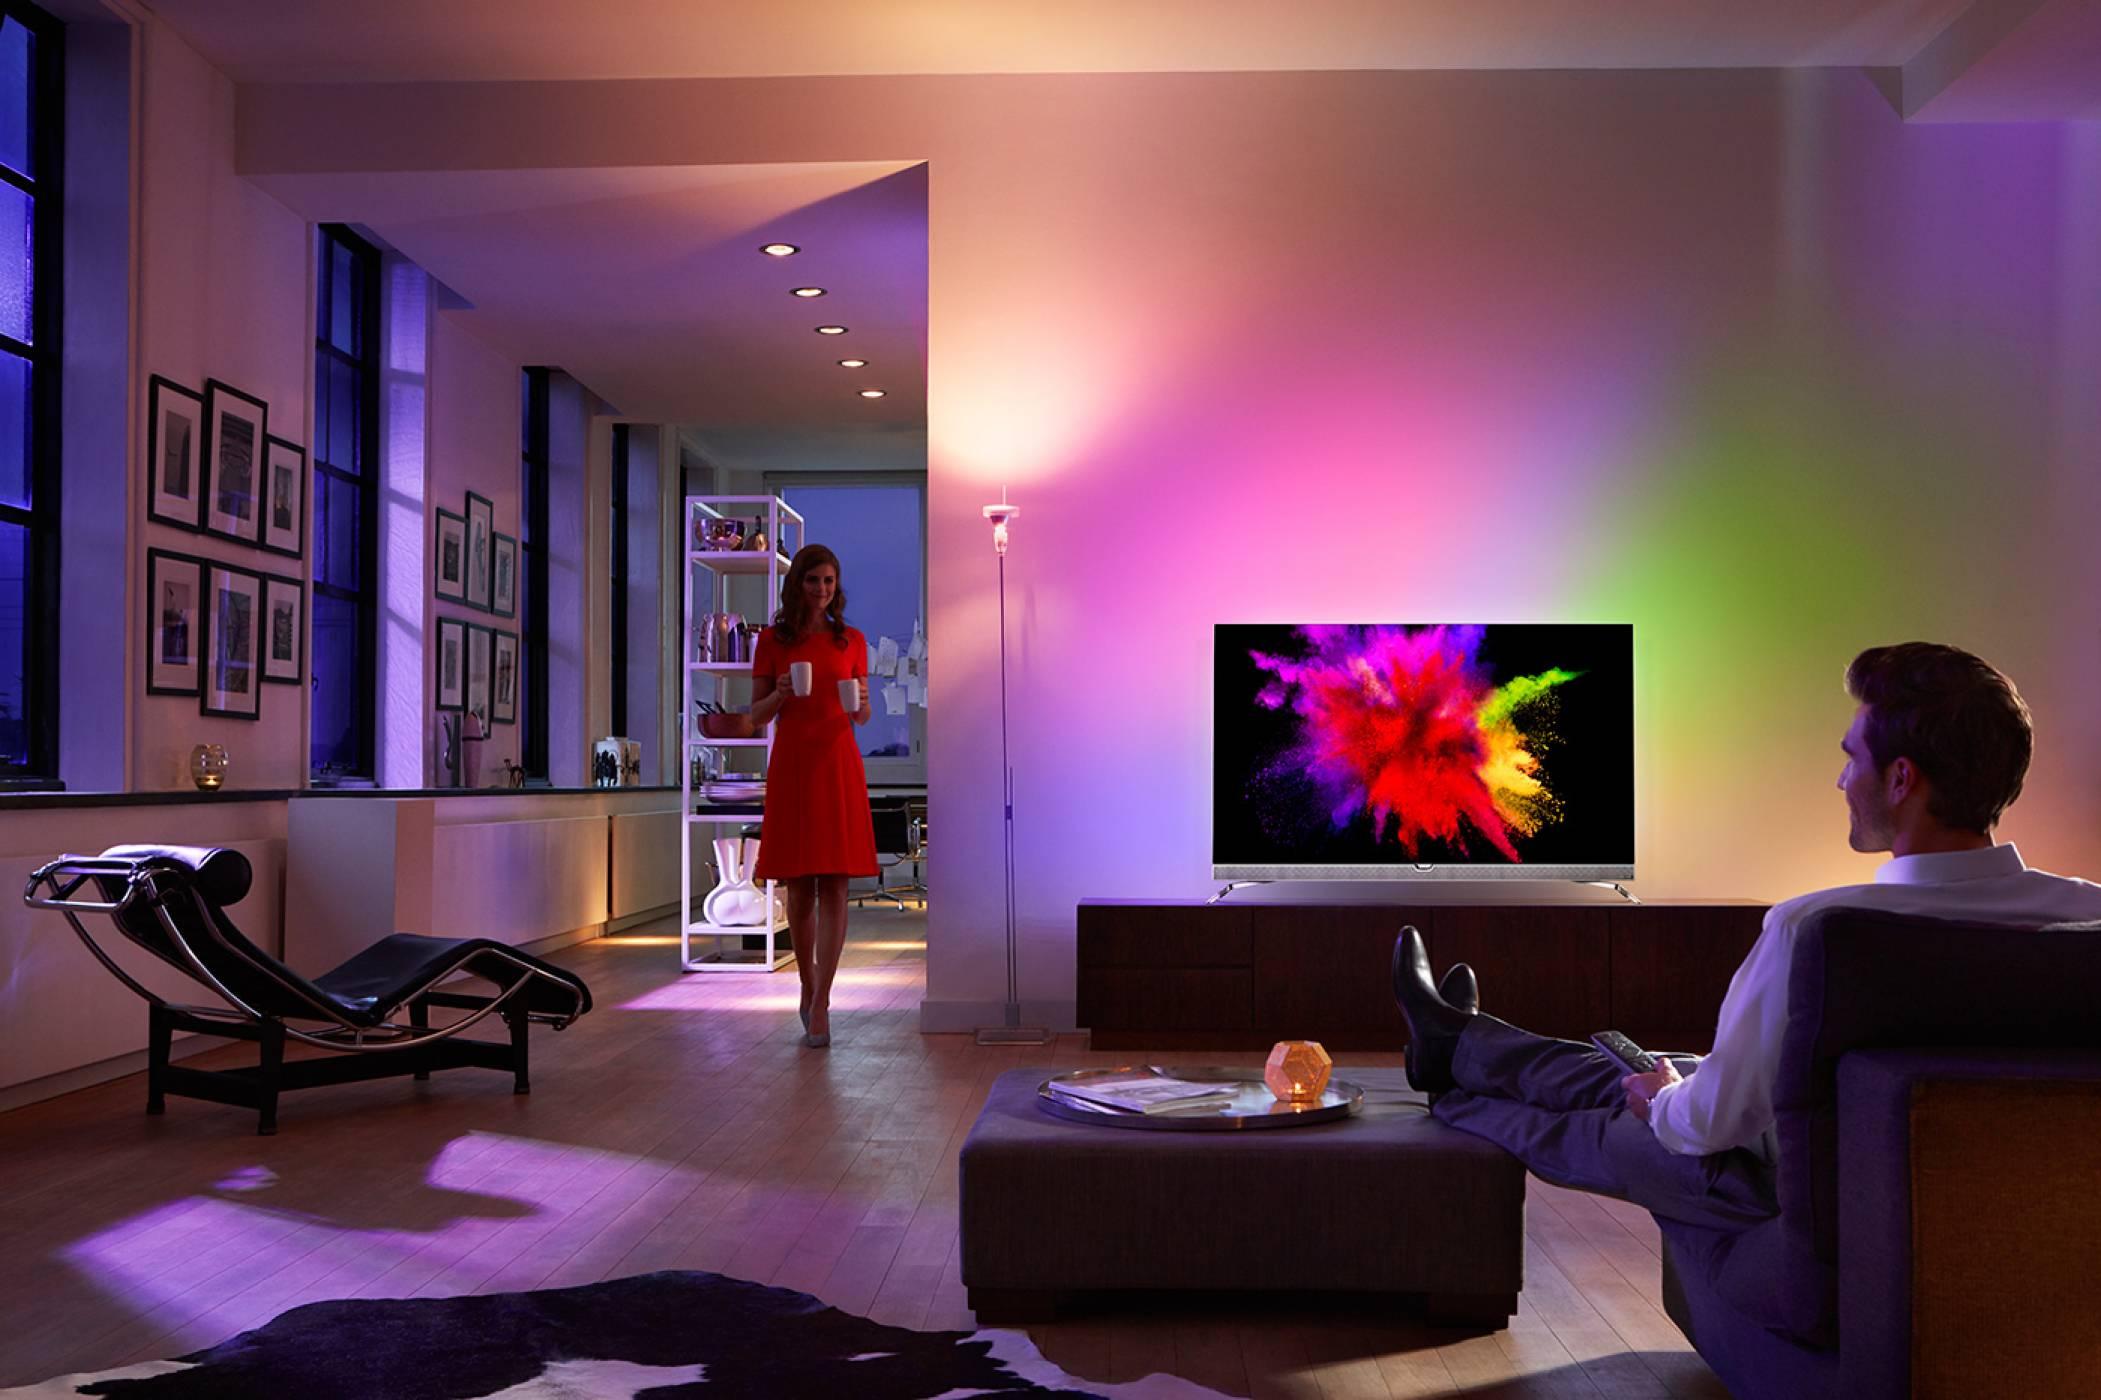 Philips през 2017: ярка светлина  около поглъщащо черно